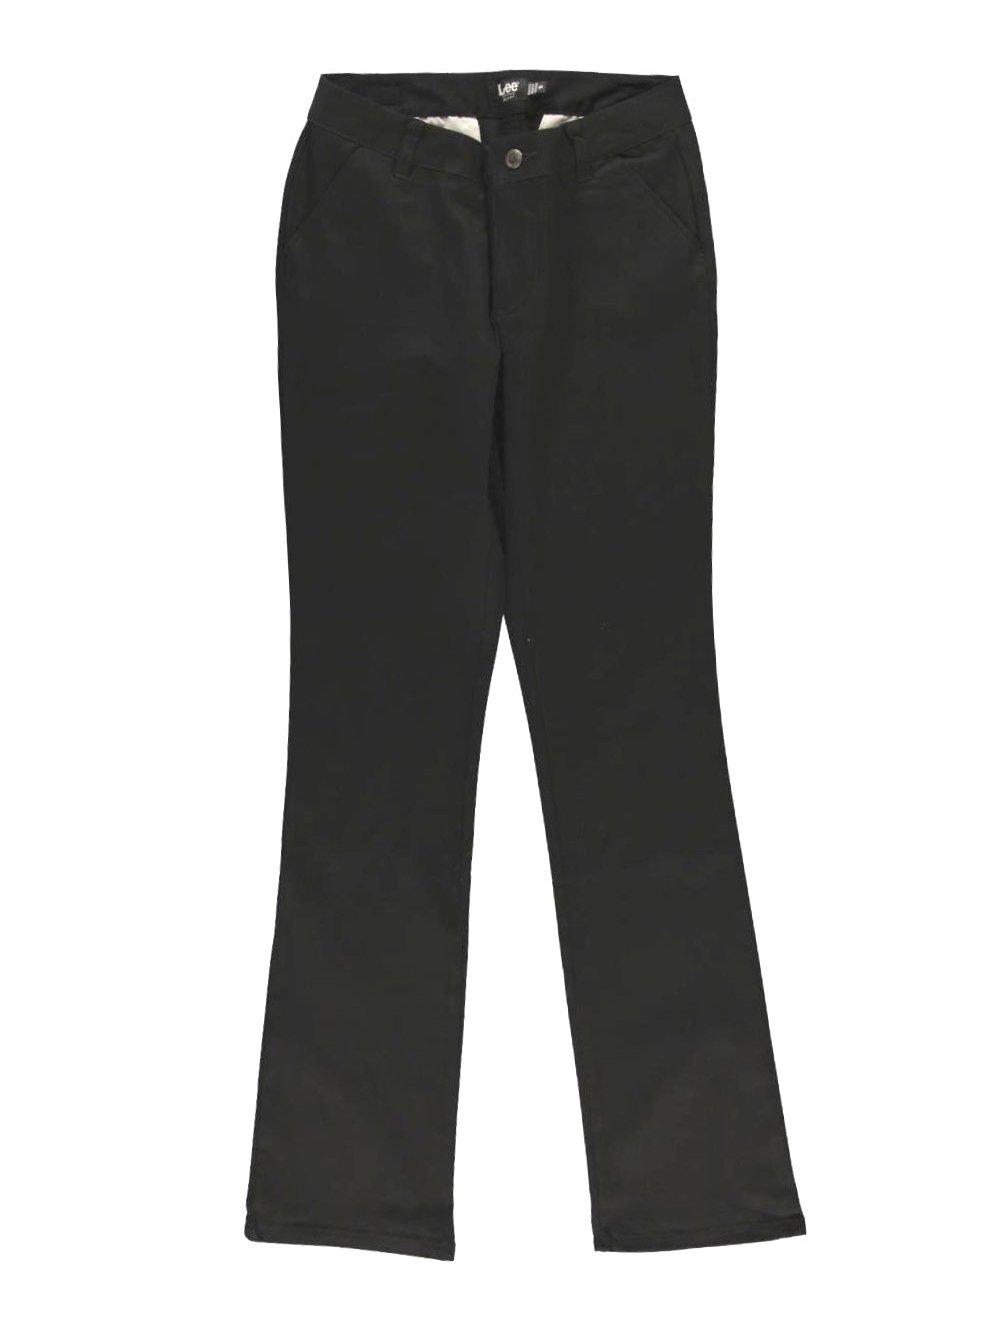 LEE Uniforms Juniors Curvey Straight Leg Pant, Black, 9